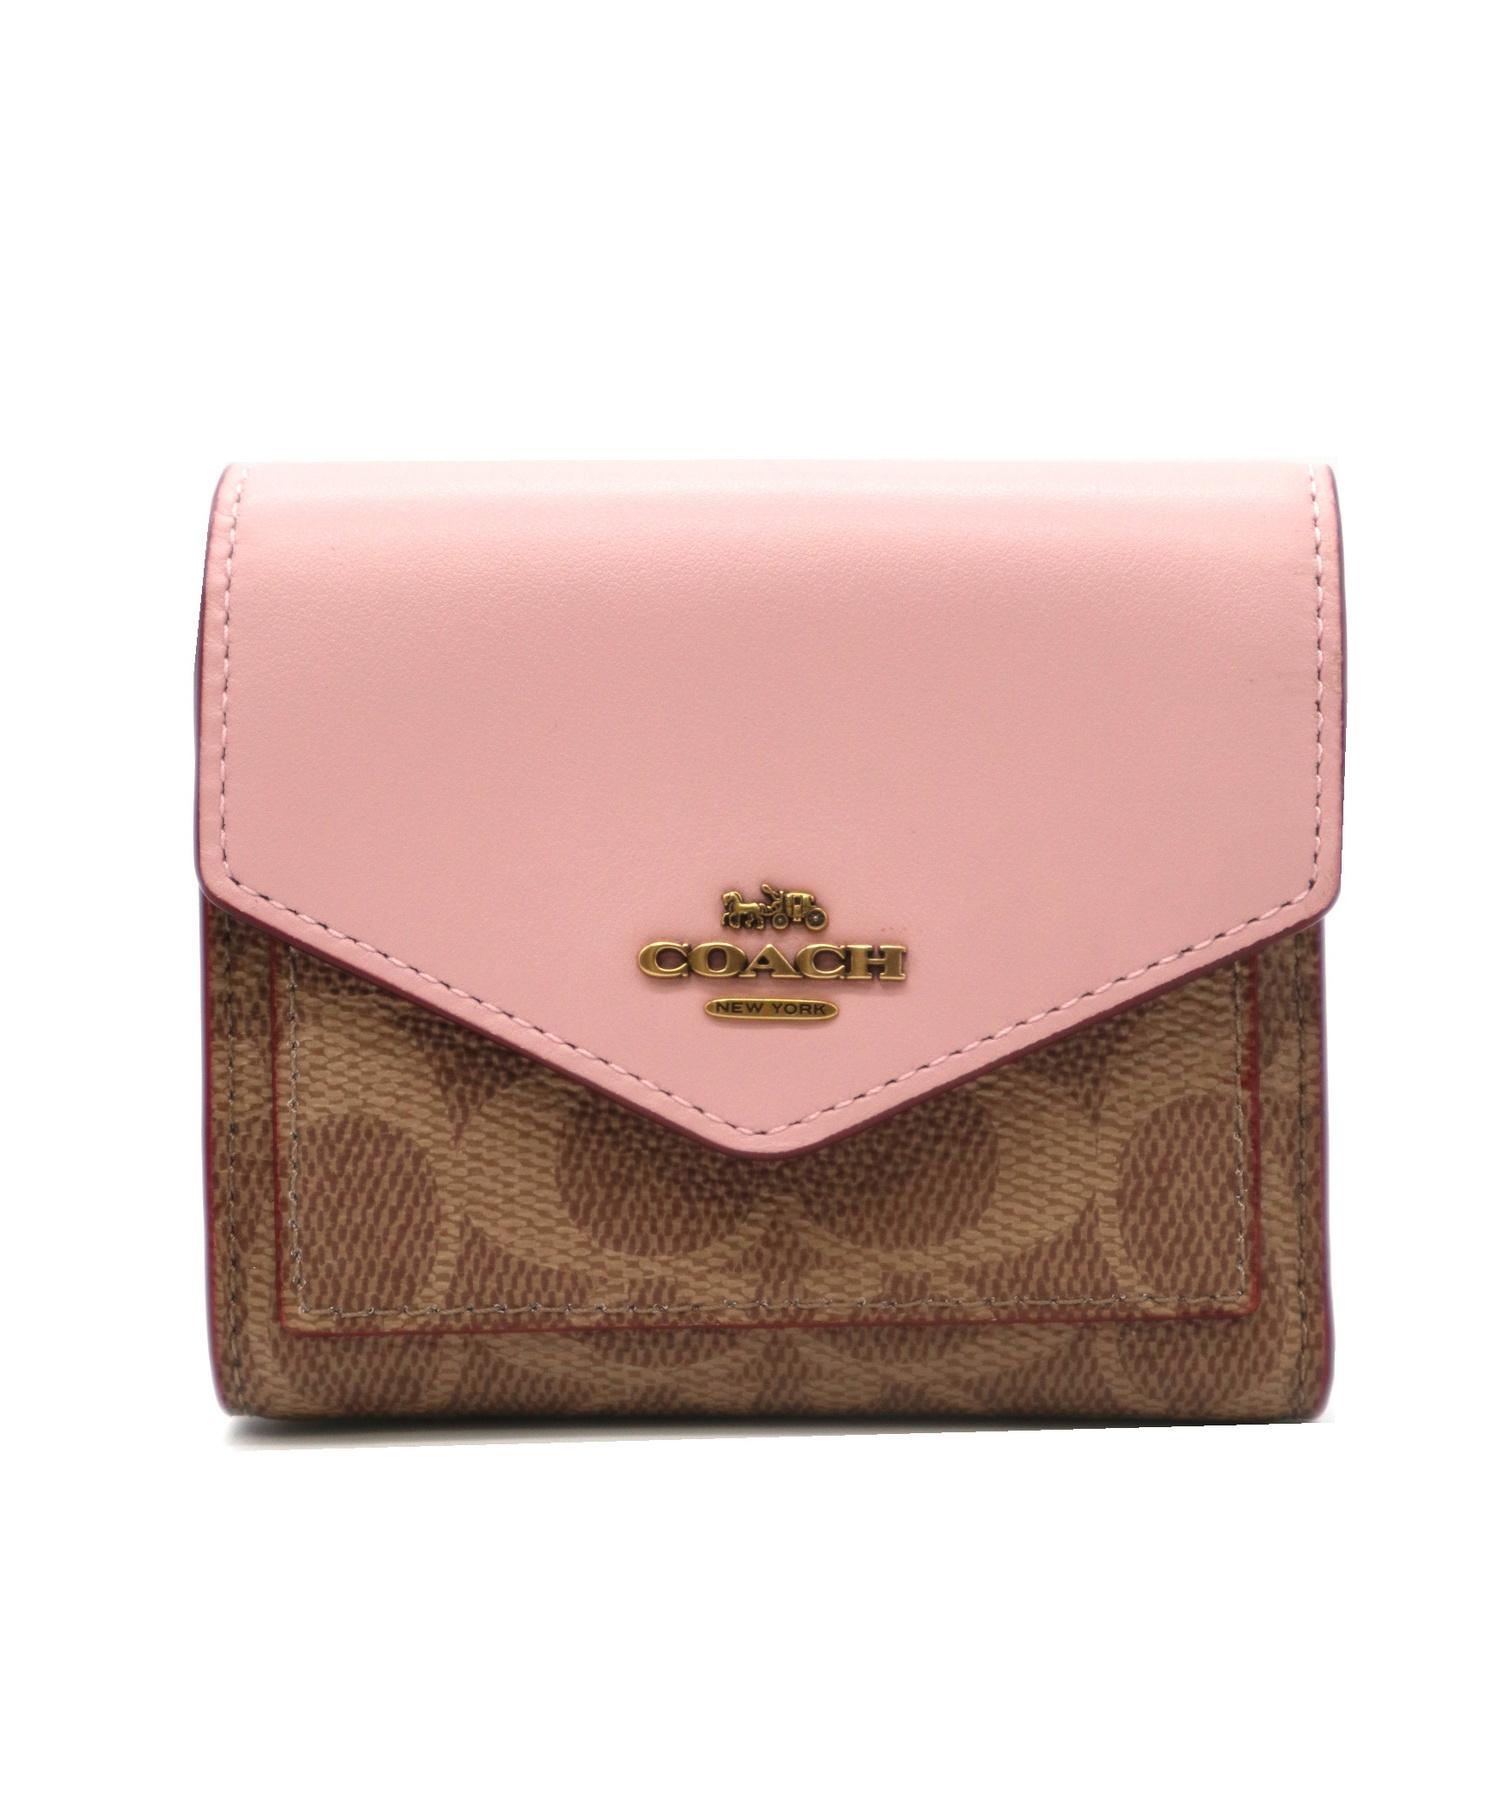 the latest f0813 b01f2 [中古]COACH(コーチ)のレディース 服飾小物 2つ折り財布